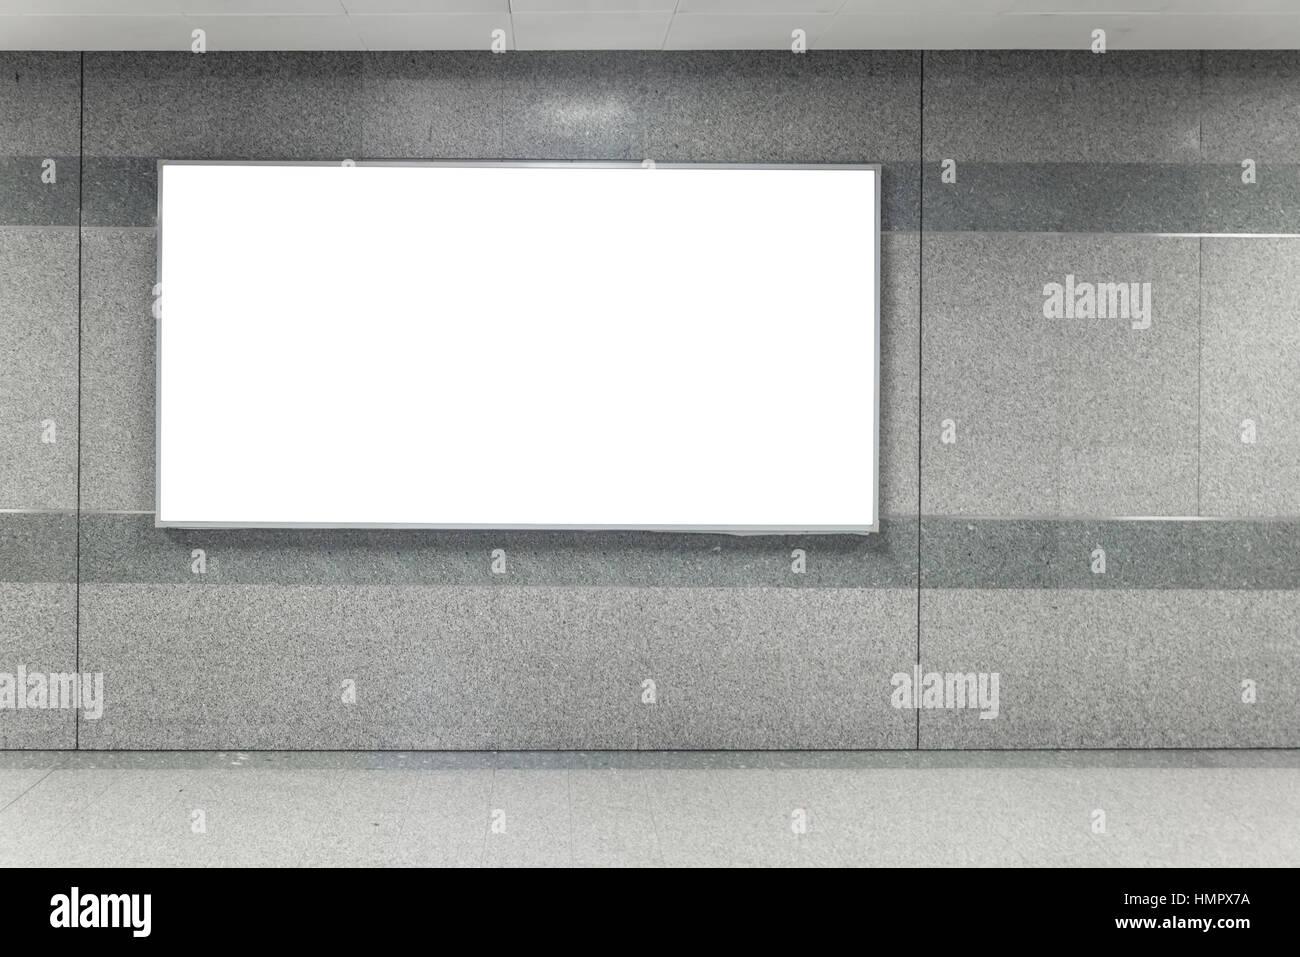 Billboard Banner signage mock up display in subway train station. - Stock Image